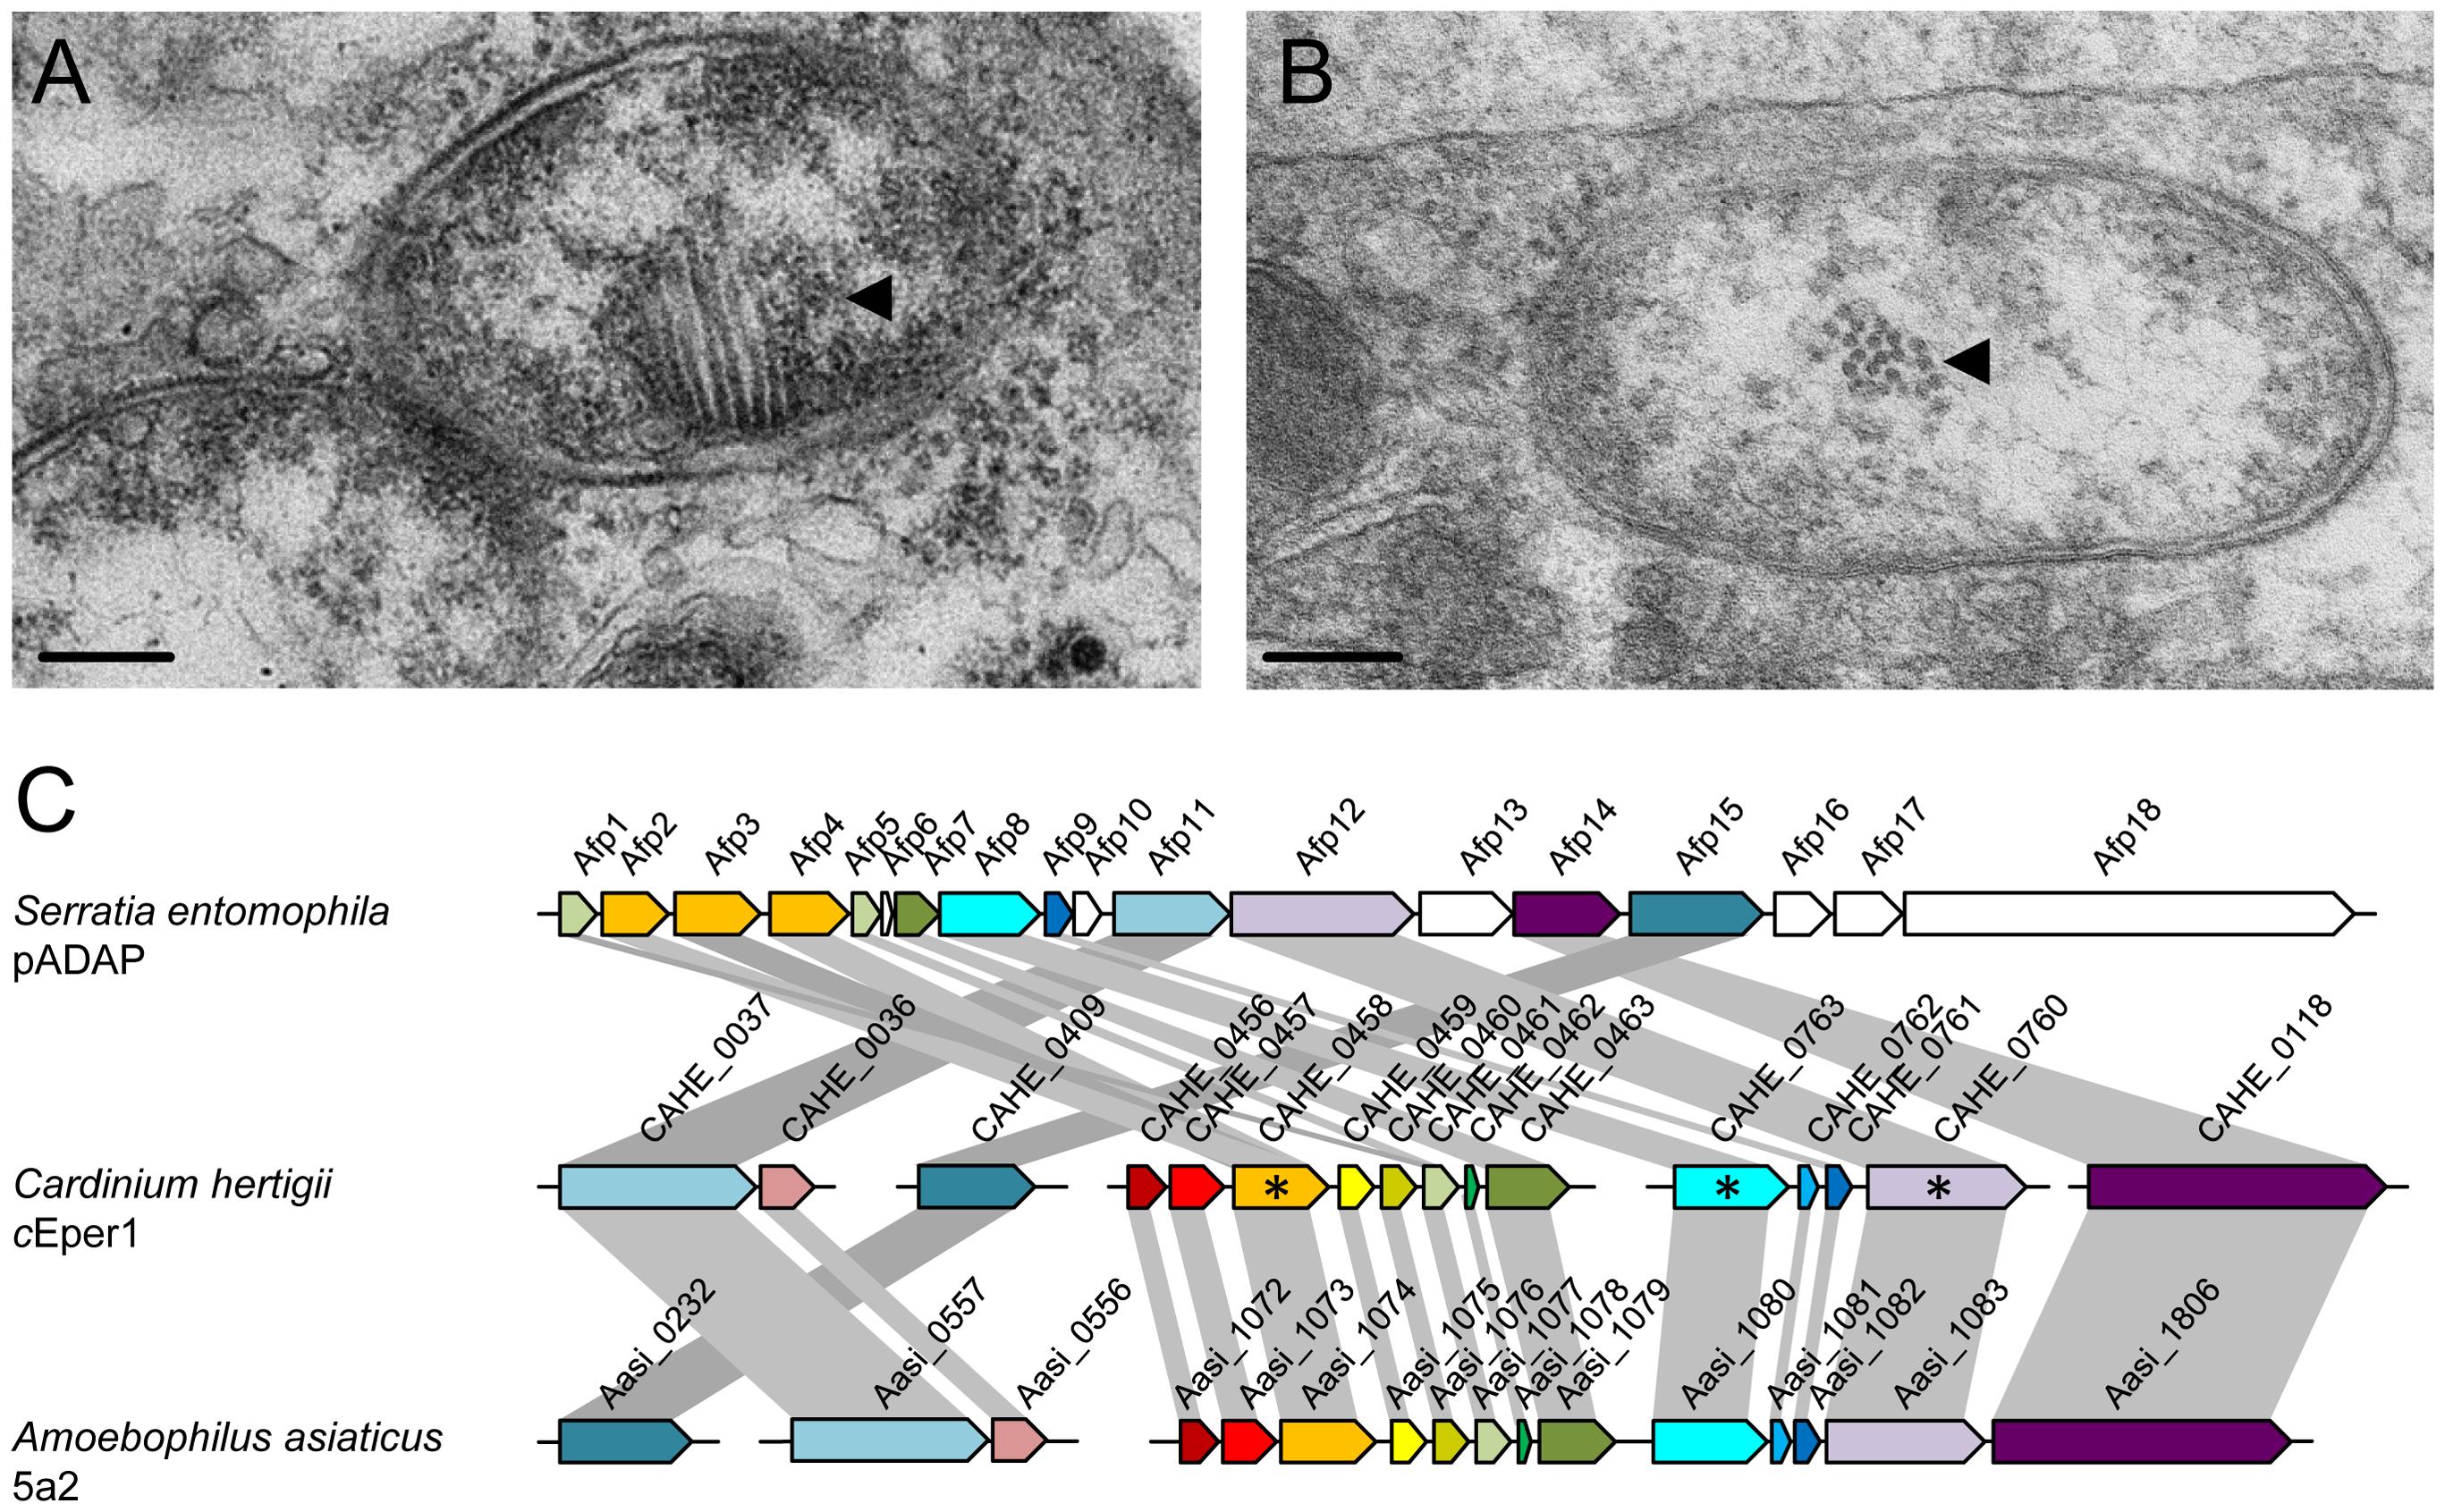 The putative phage derived protein secretion system of <i>Cardinium hertigii c</i>Eper1.